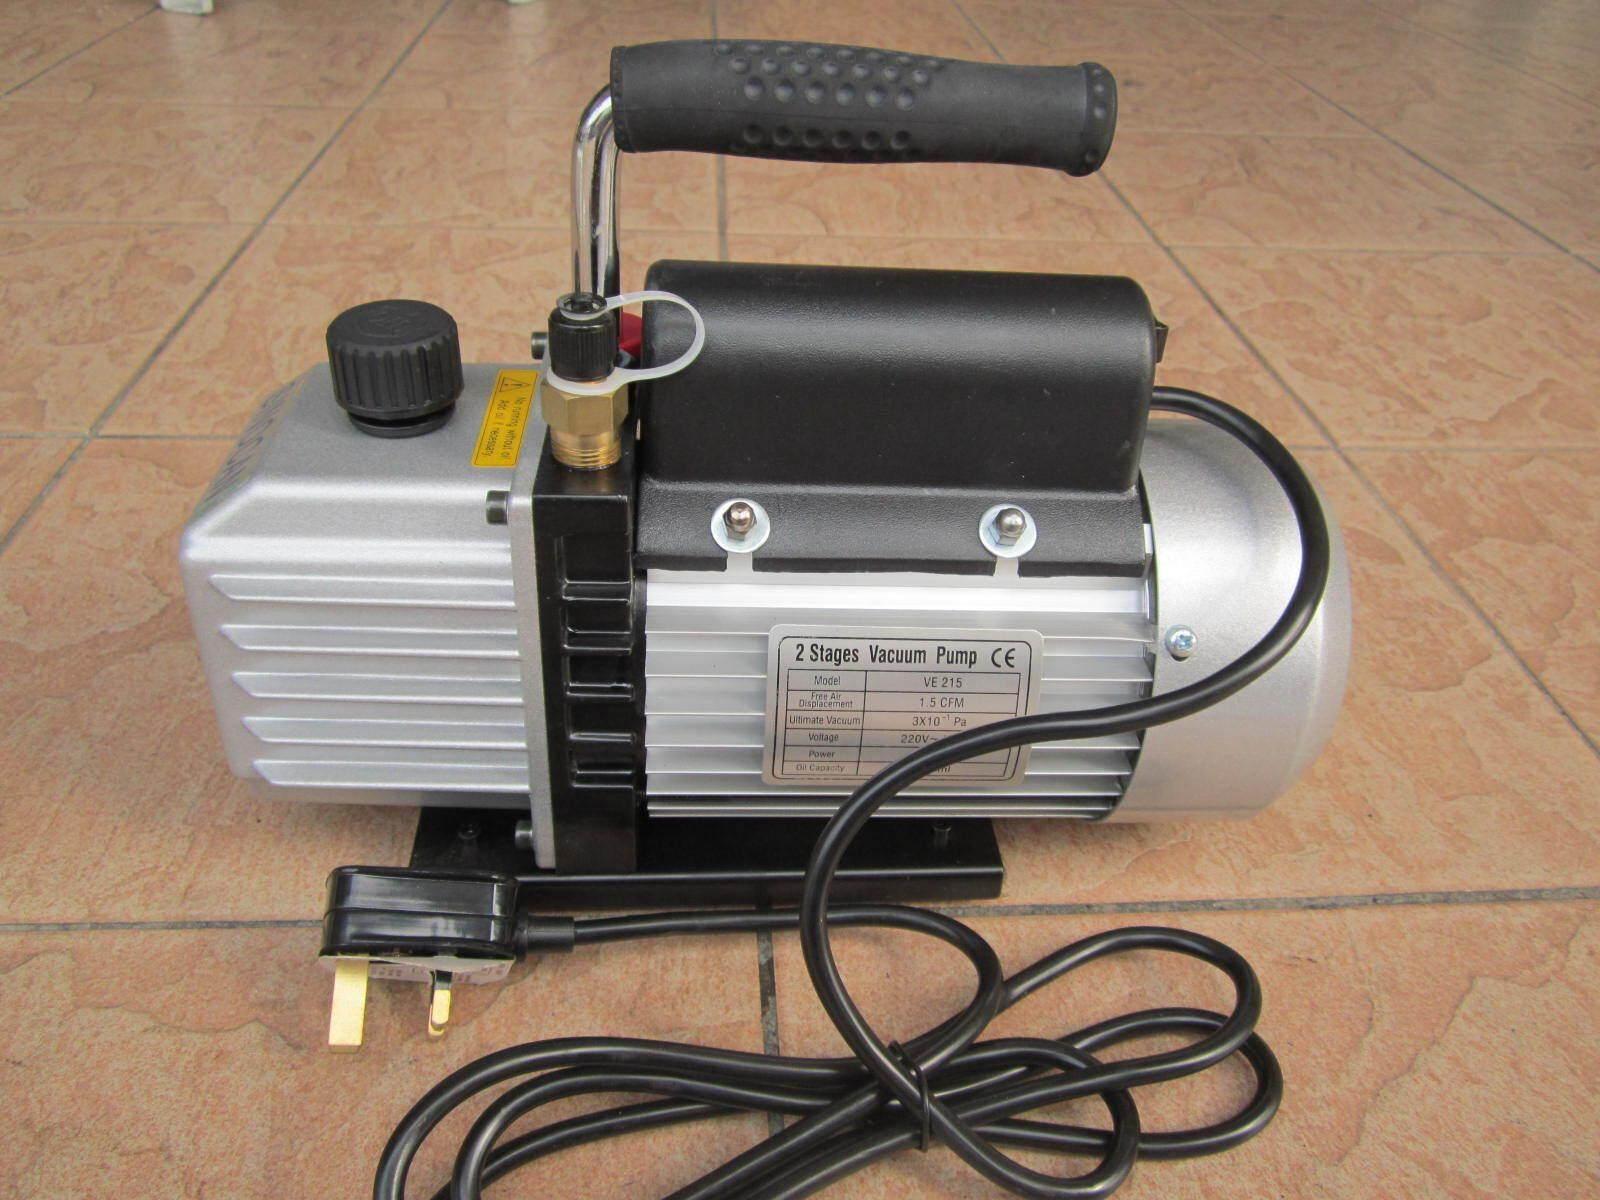 Sinocan VE215 (1.5CFM) Portable 2-Stage Vacuum Pump